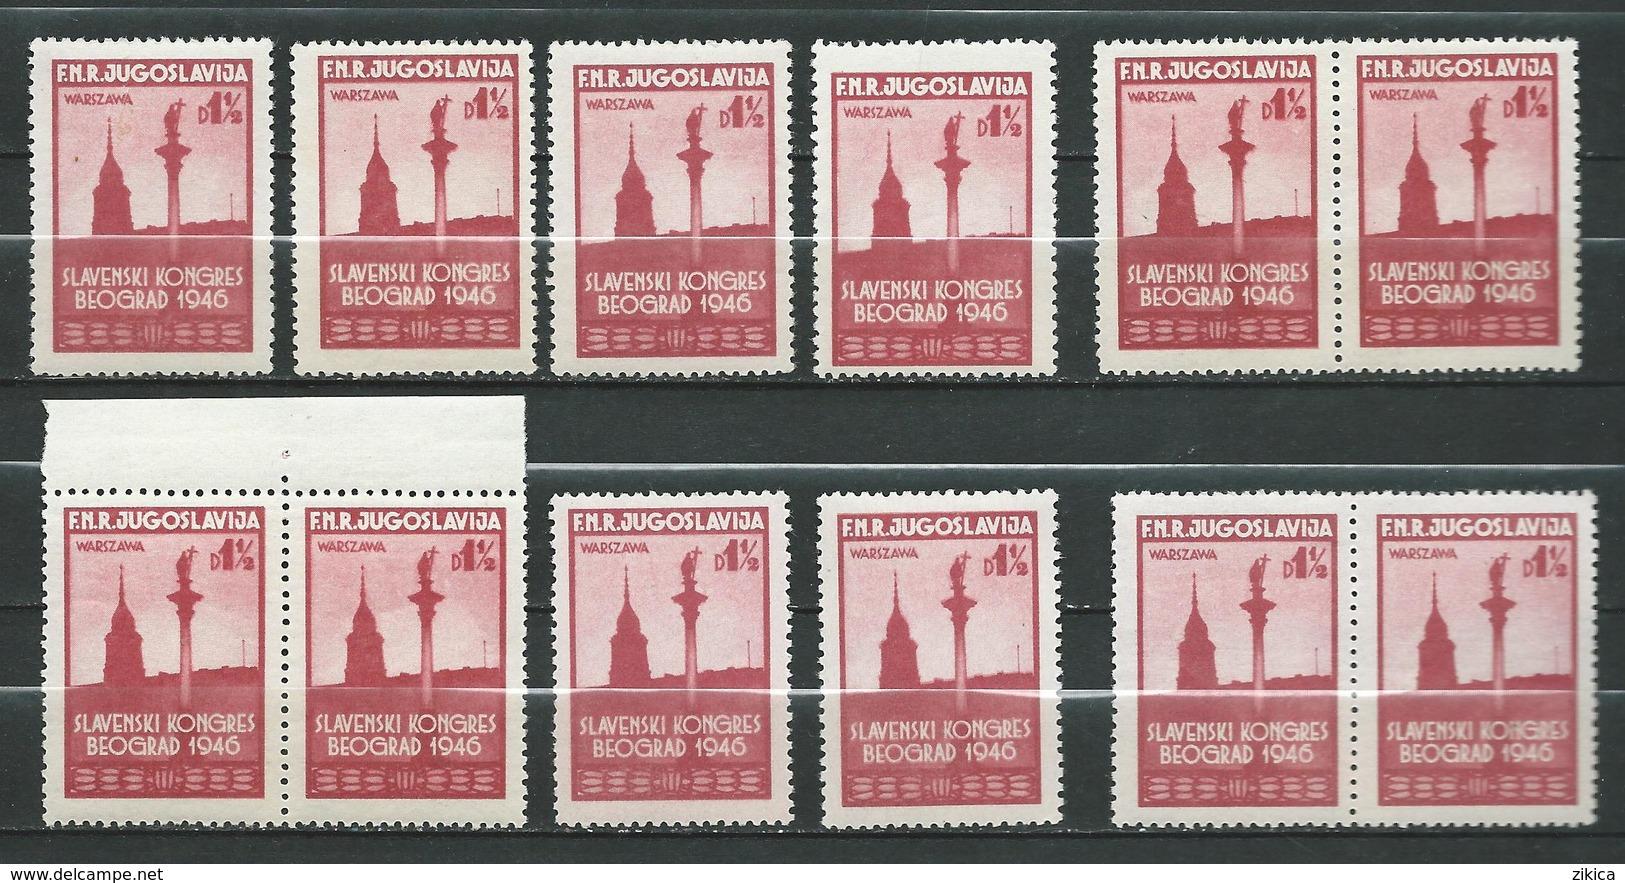 Yugoslavia 1948 Slav Congress - Lot 12 Stamps - Sigismund's Column,Warsaw, Poland - MNH** - 1945-1992 Socialistische Federale Republiek Joegoslavië